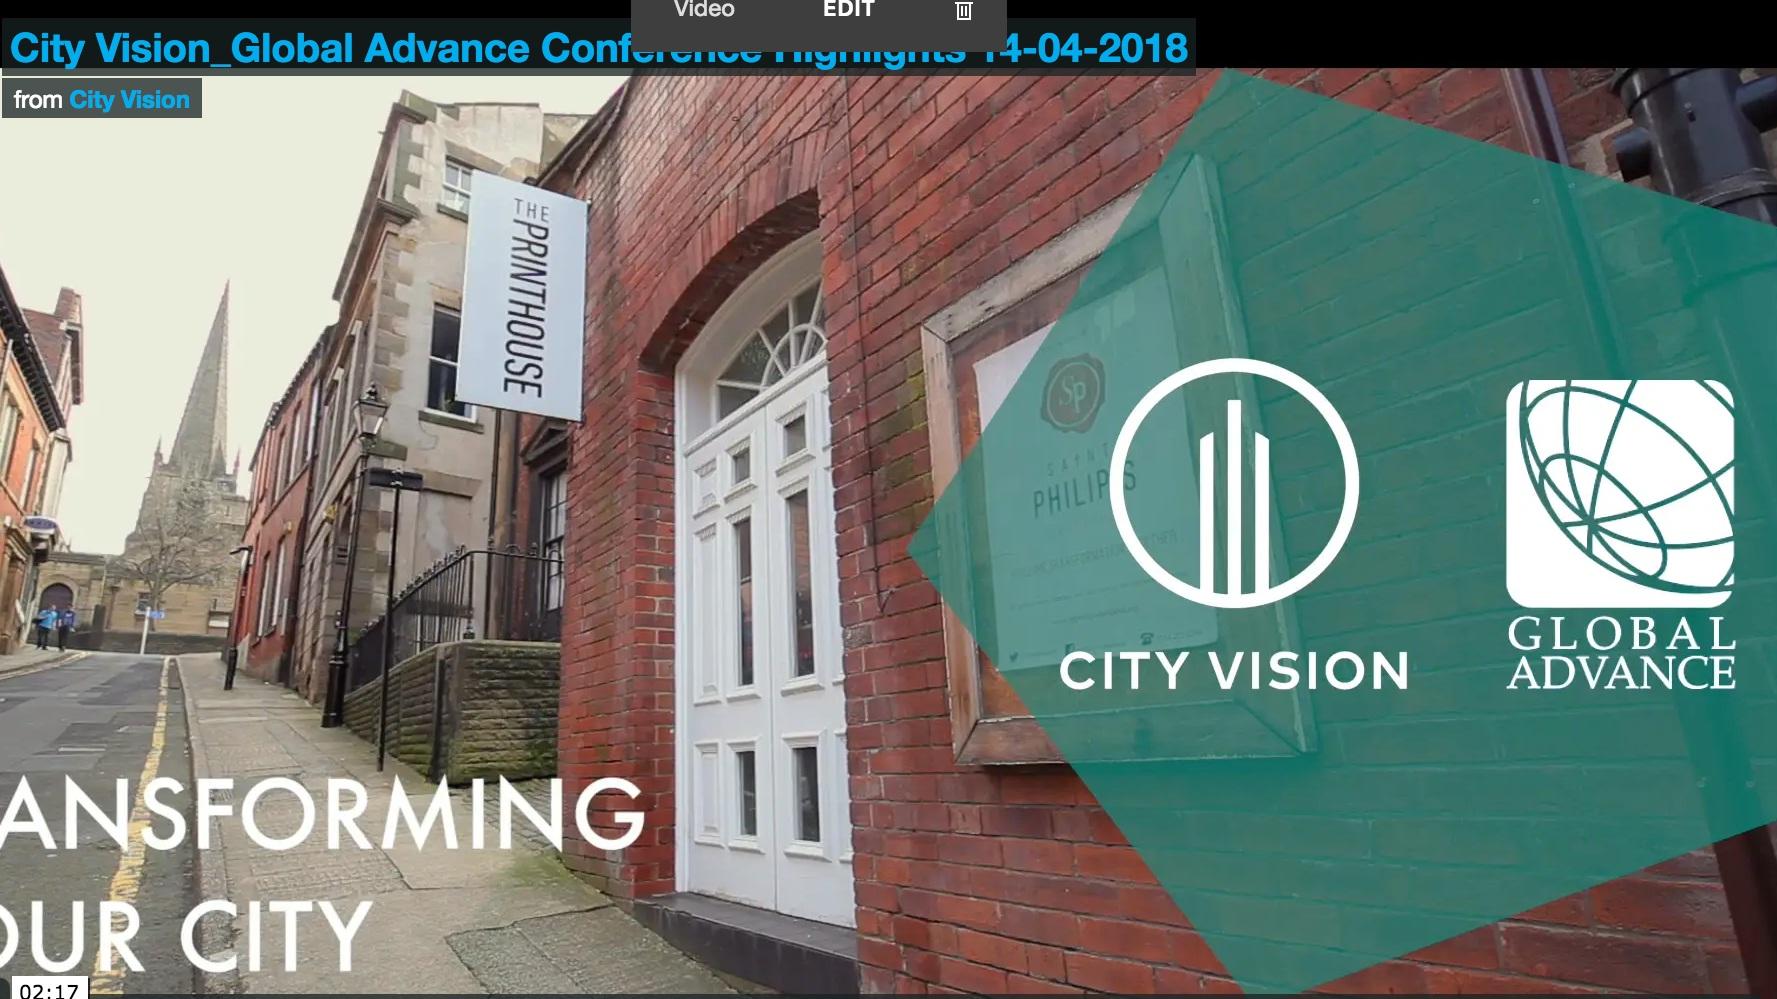 Sheffield conference, April 2018